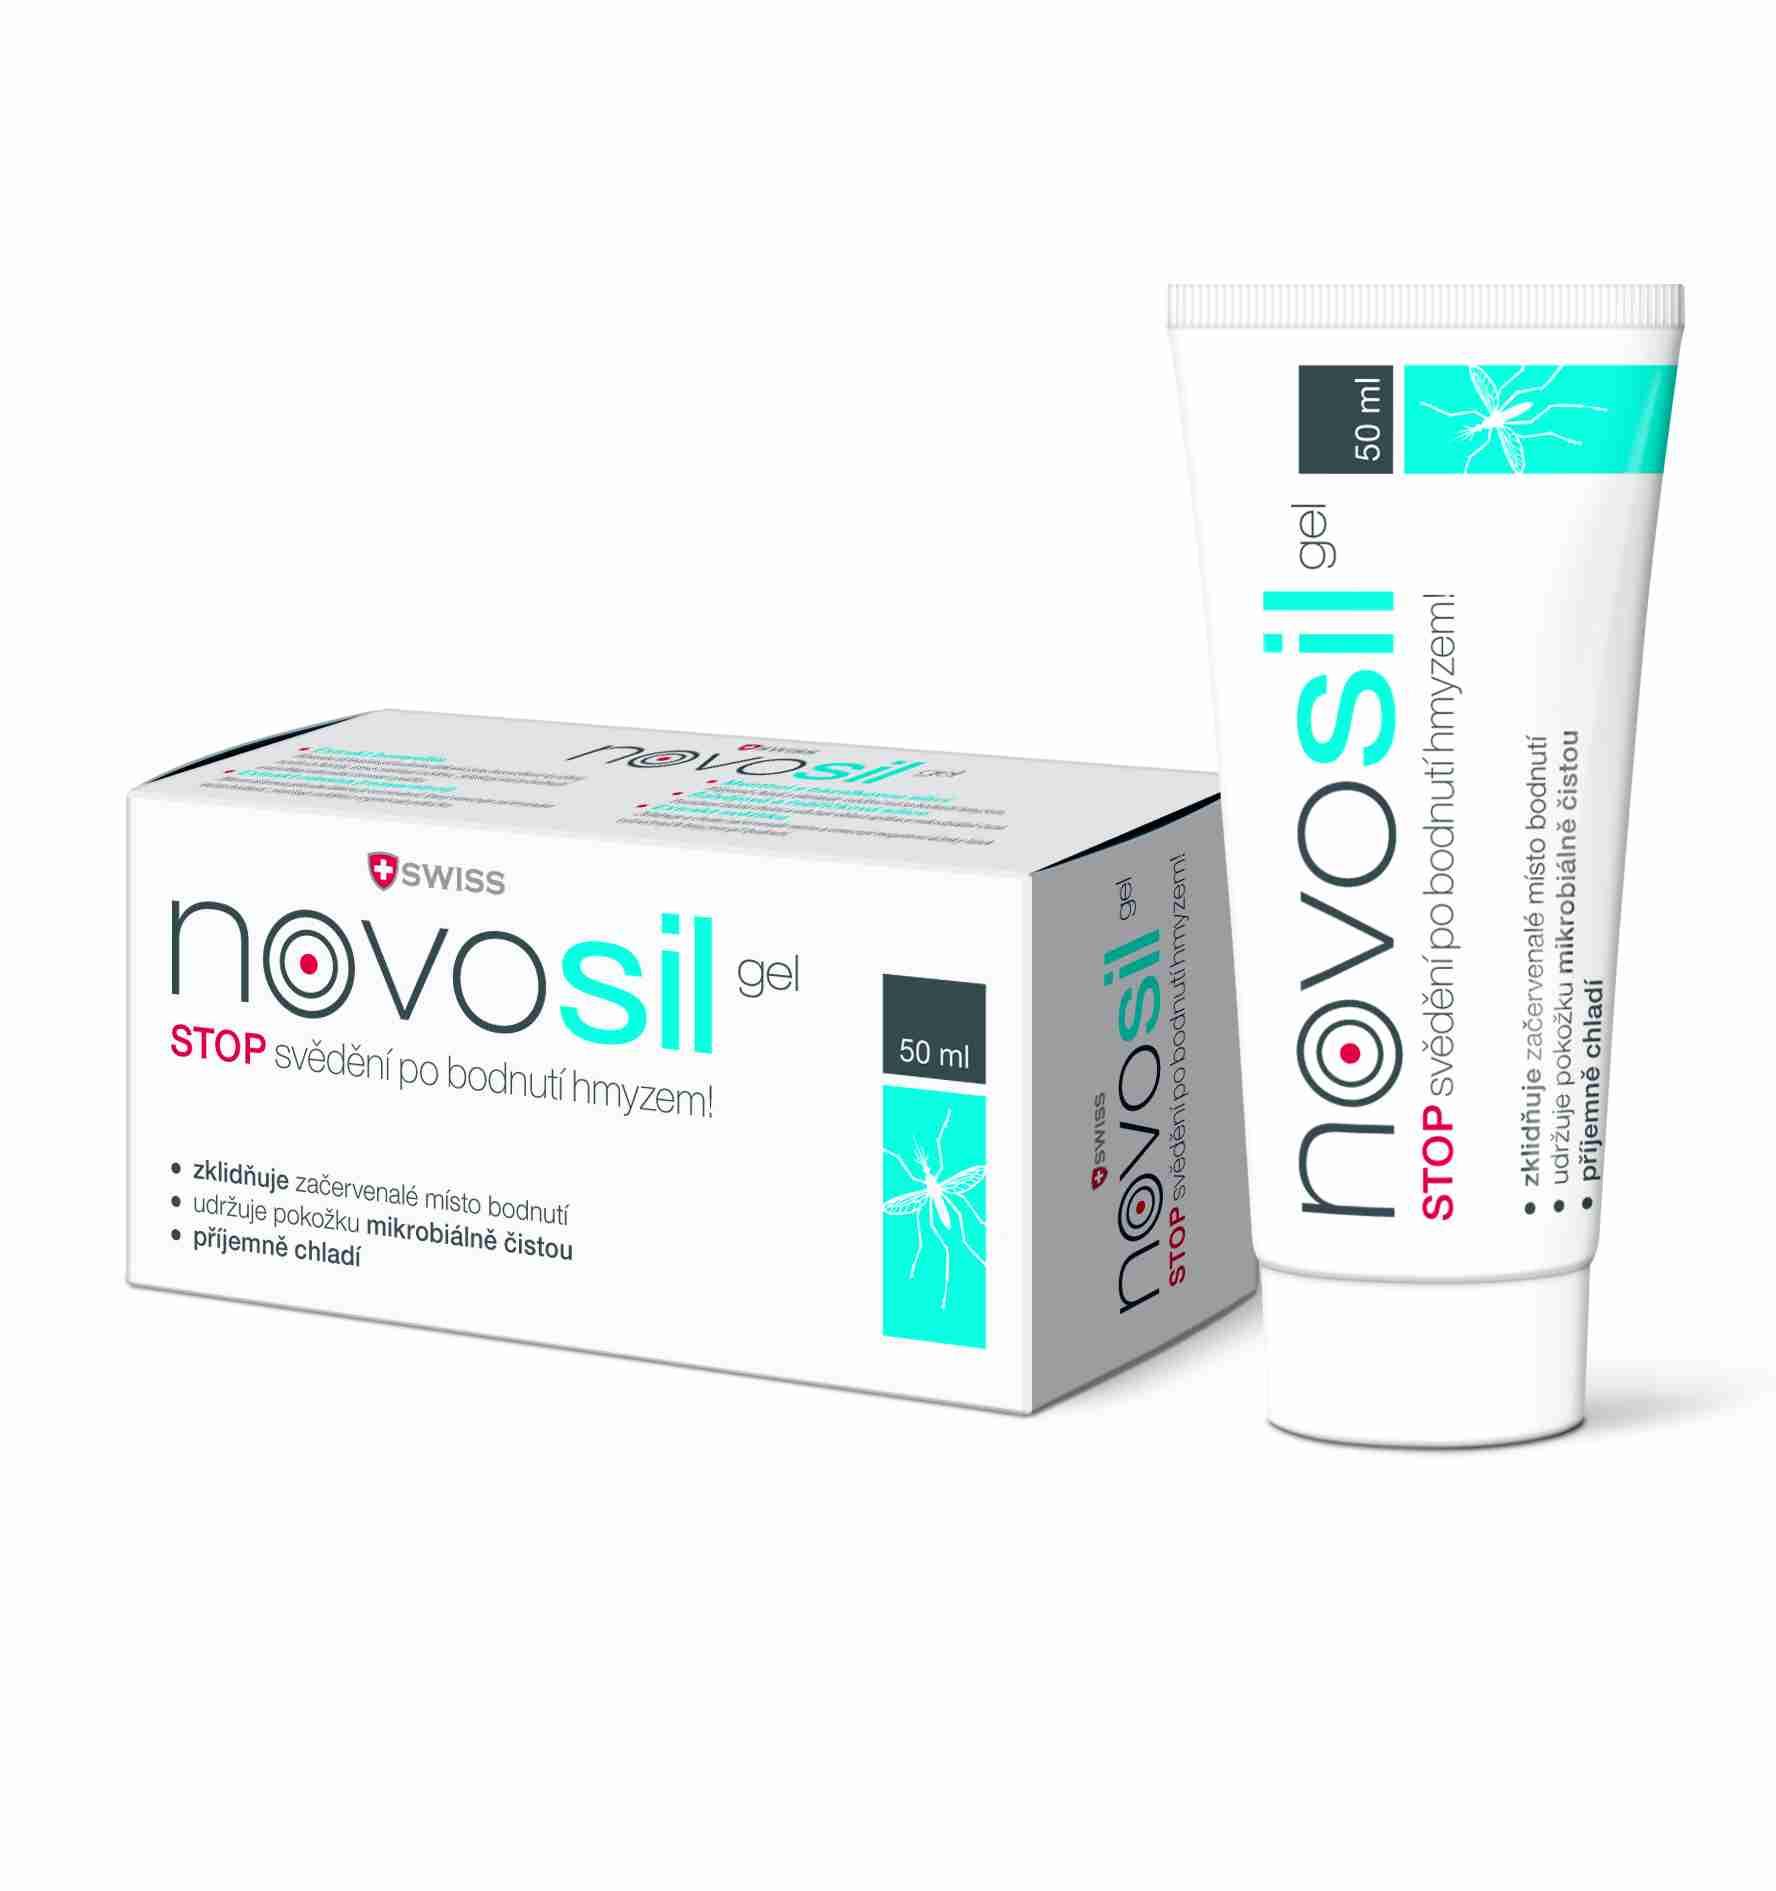 Simply You Novosil gel 50 ml